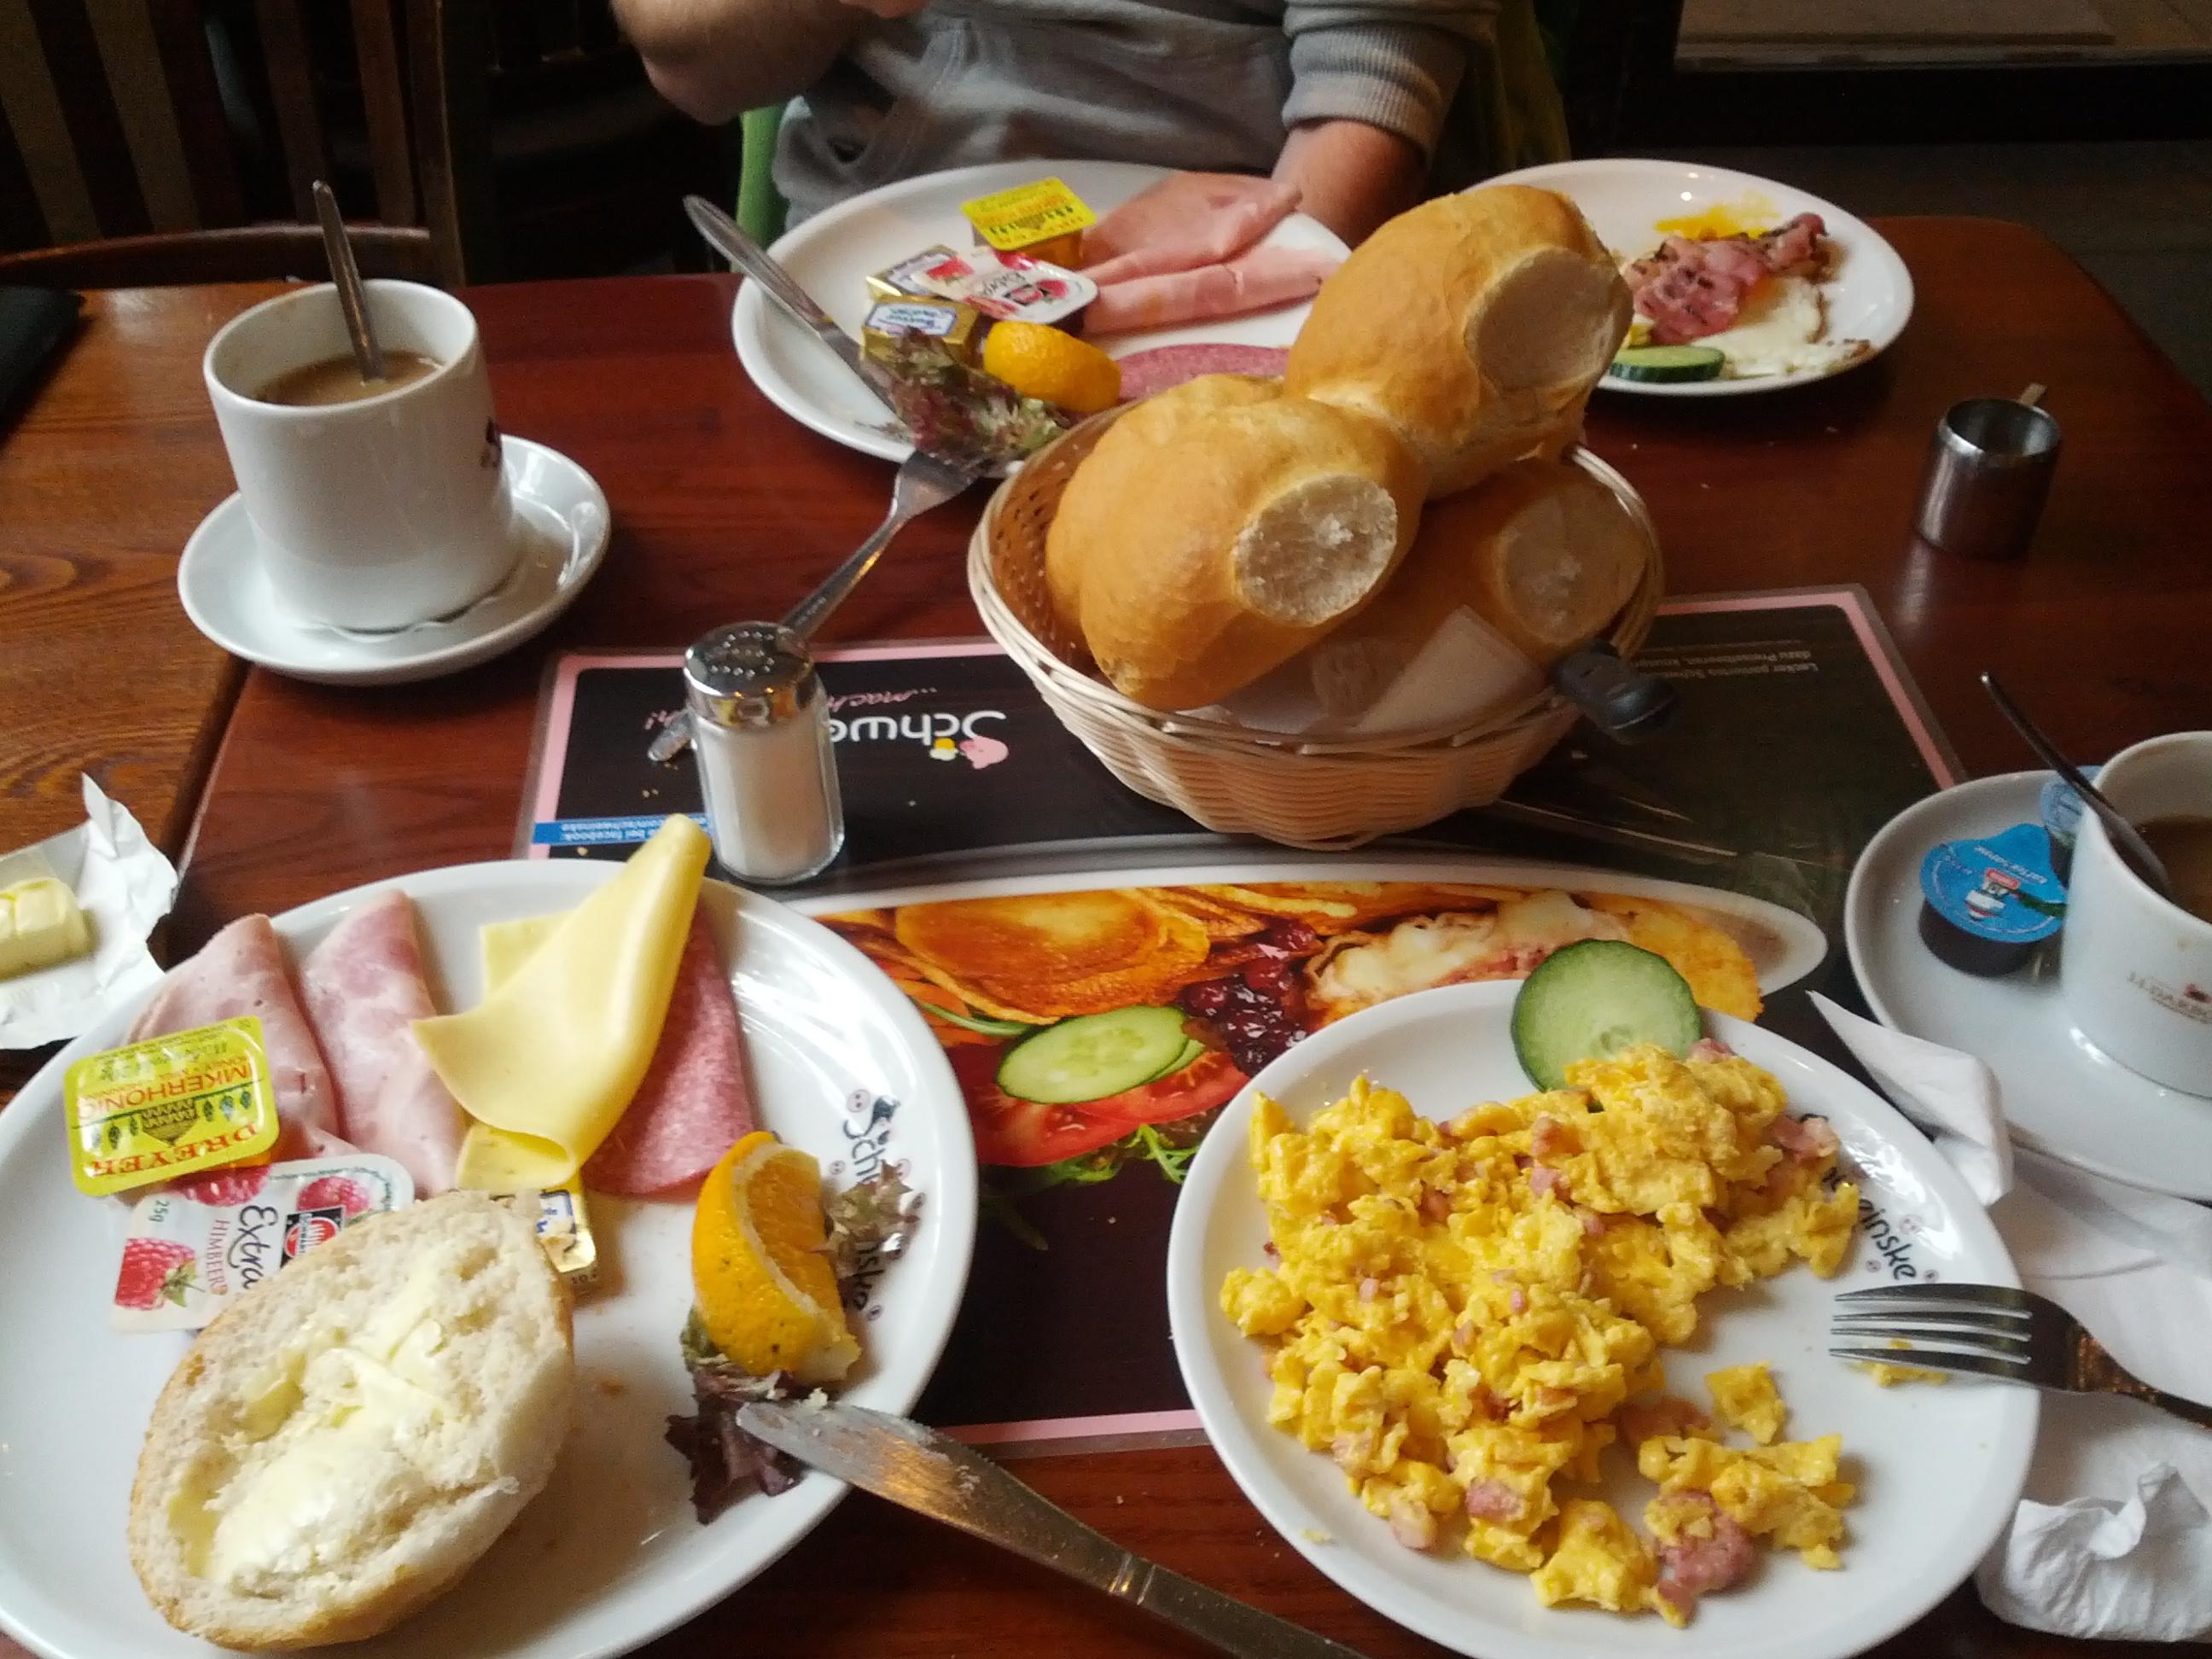 https://foodloader.net/Henrik_2012-07-19_Breakfast.jpg